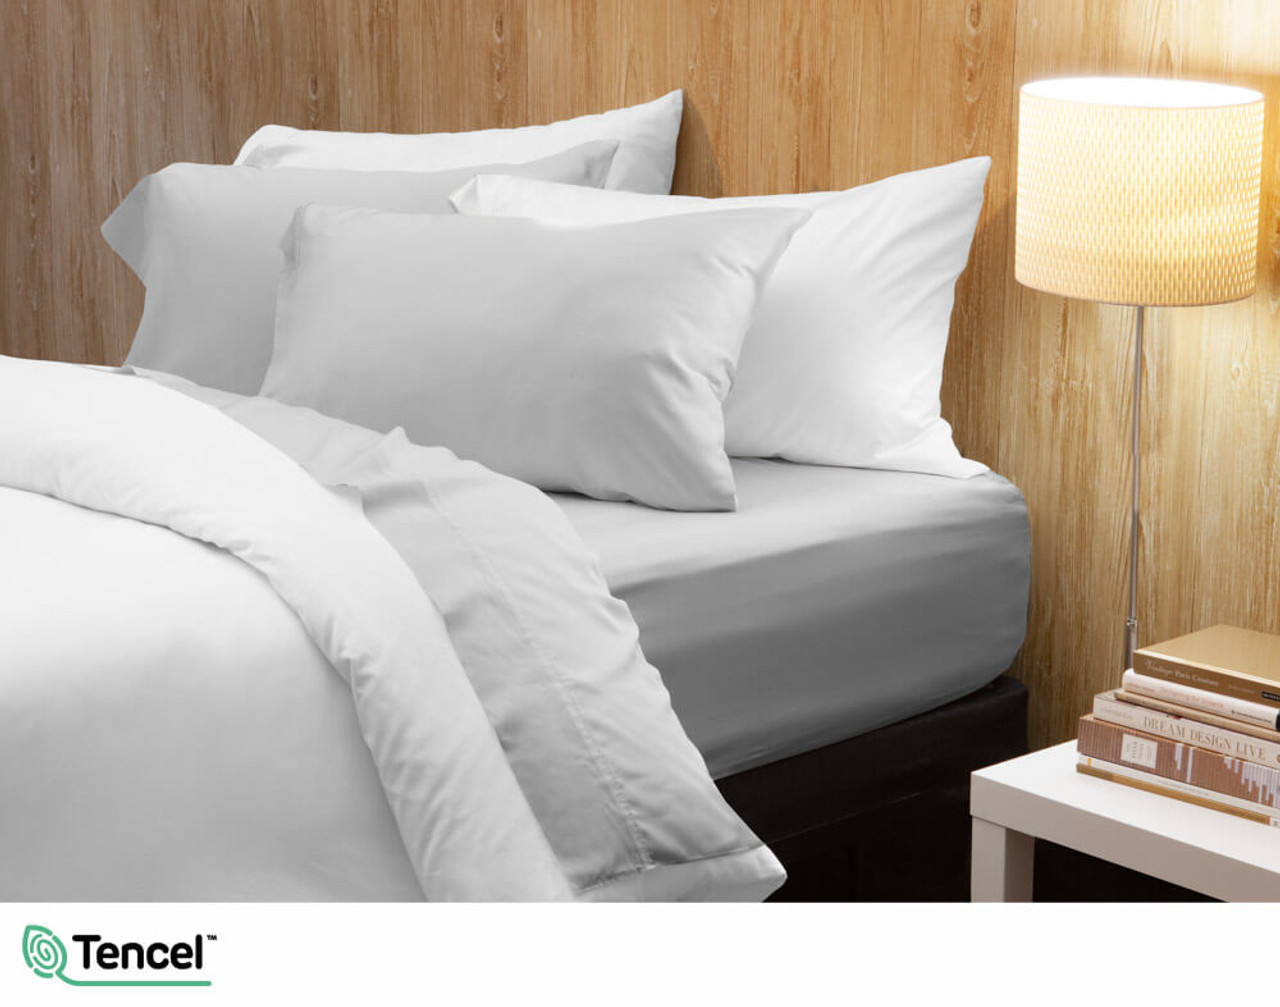 300TC TENCEL™ Lyocell Blend Sheet Set in Mist, a light silver grey colour